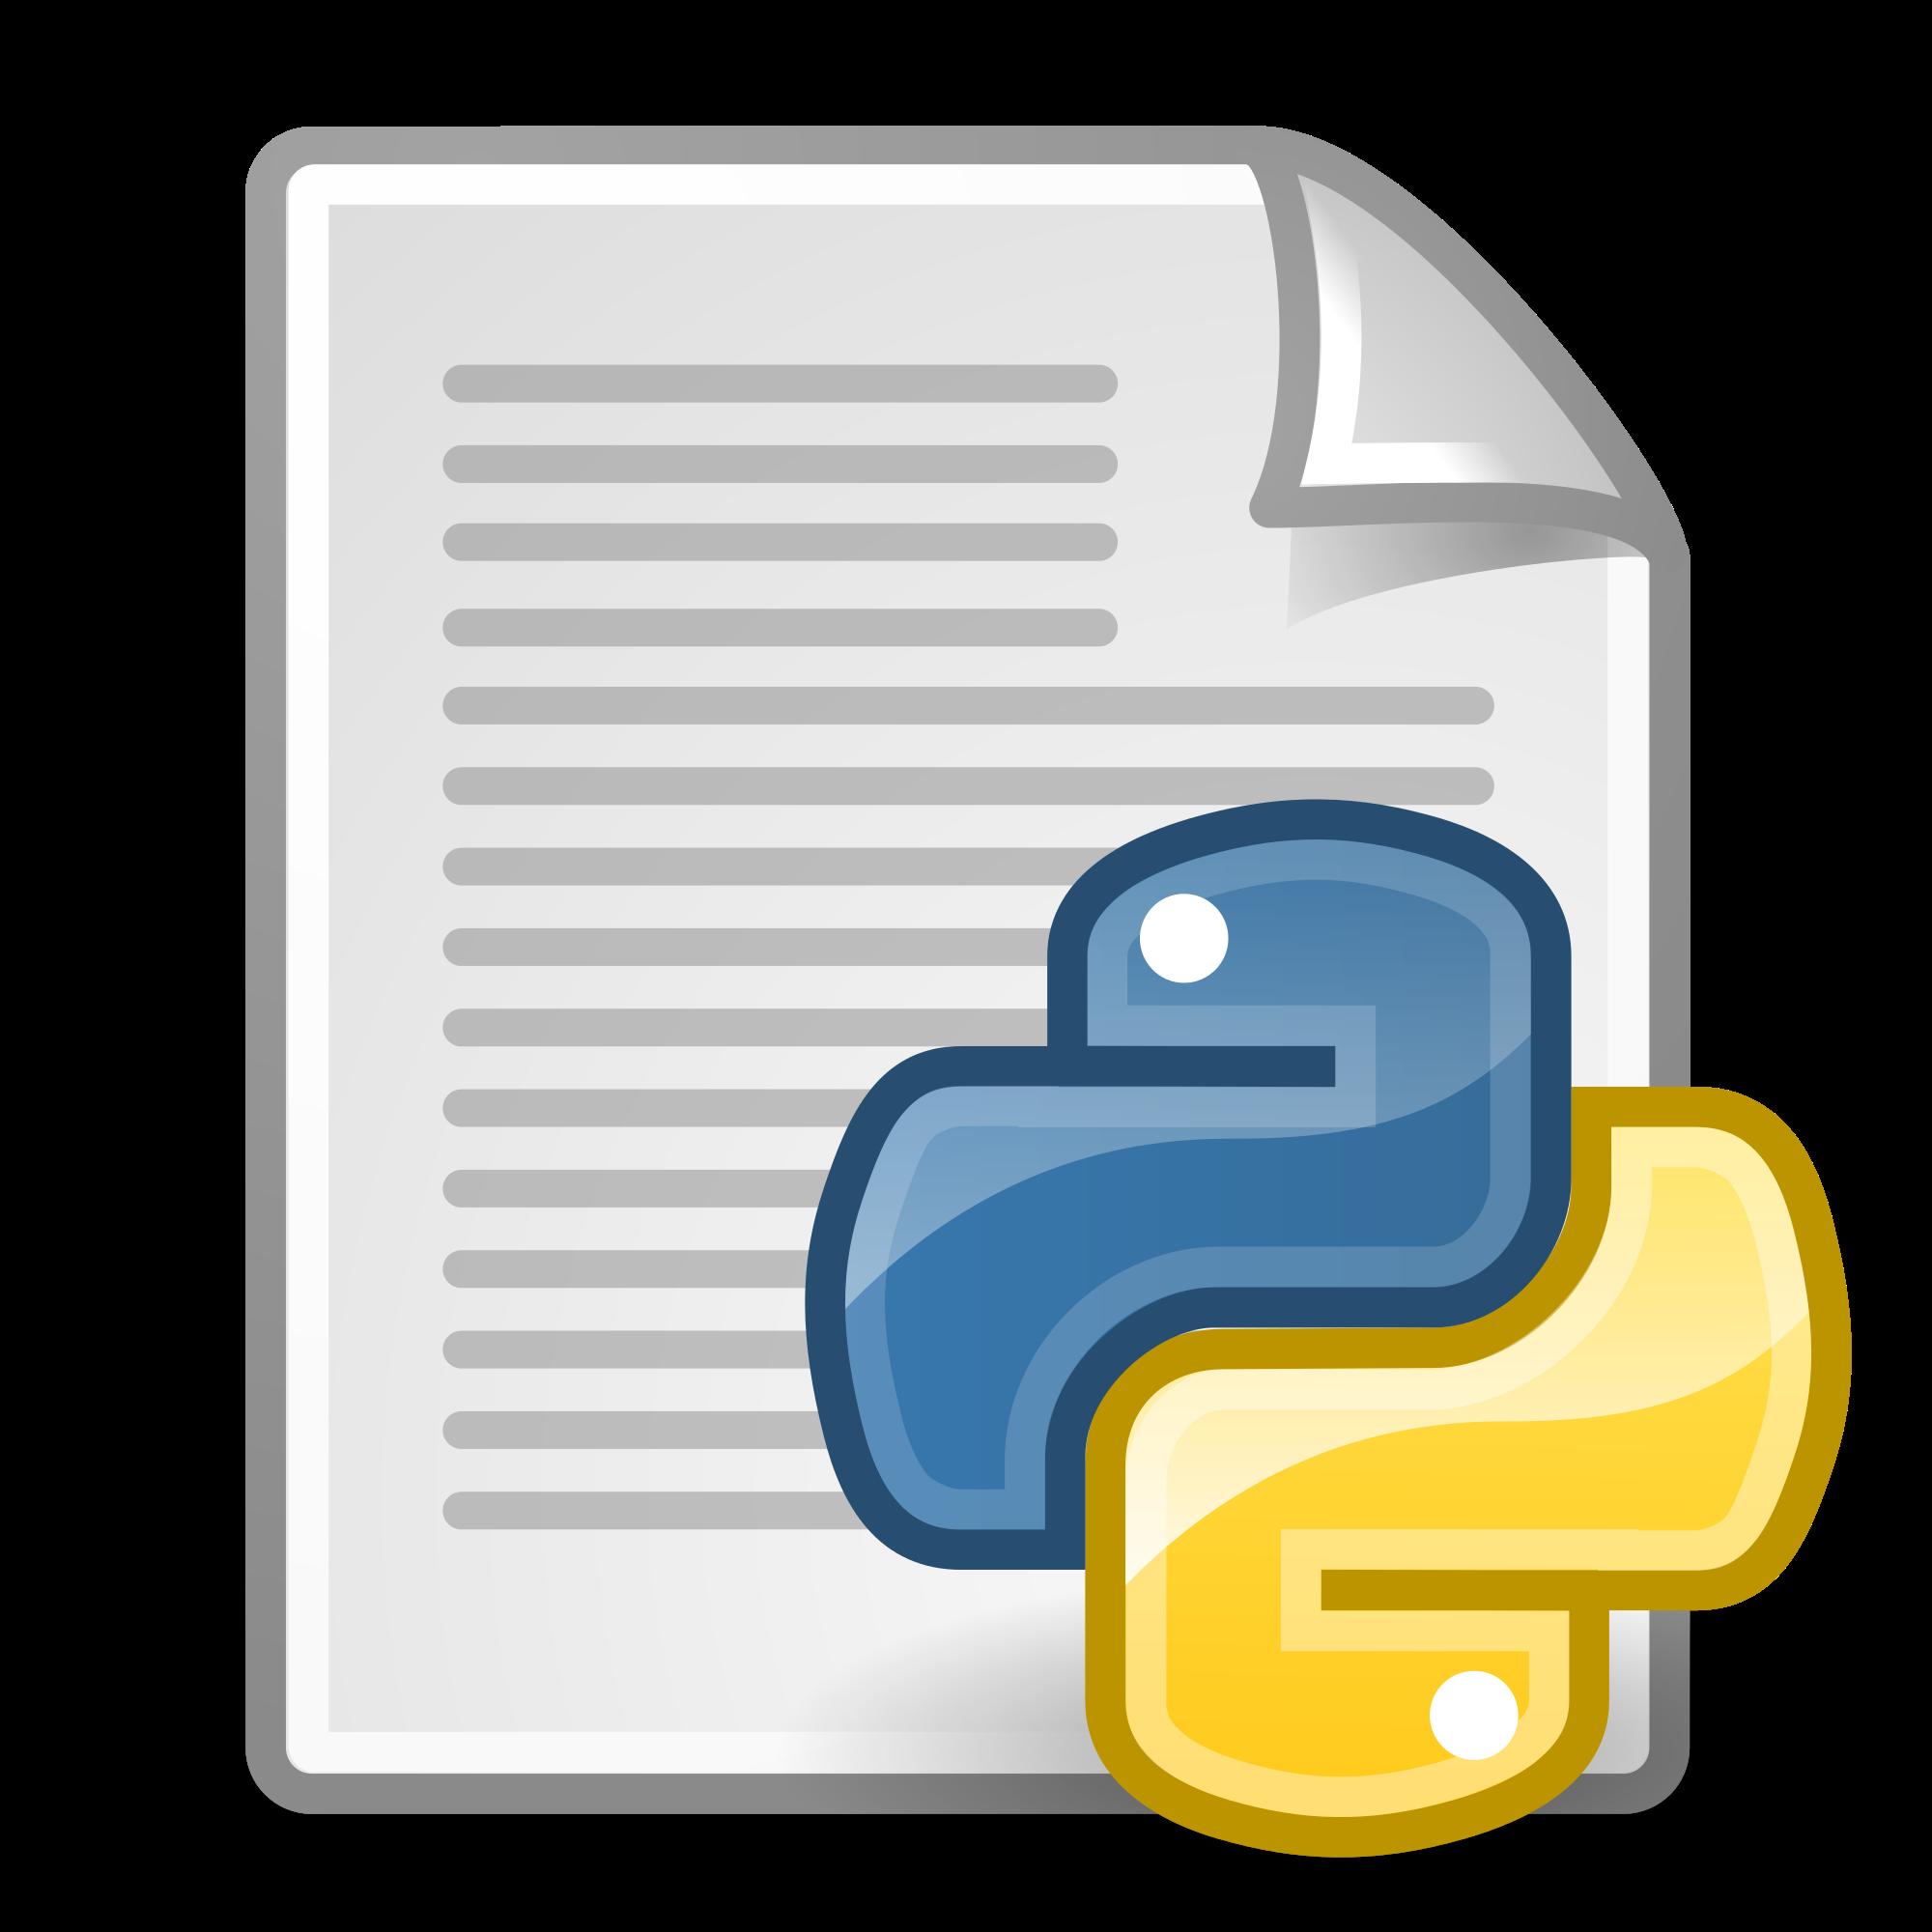 Python Icon Png #88181.